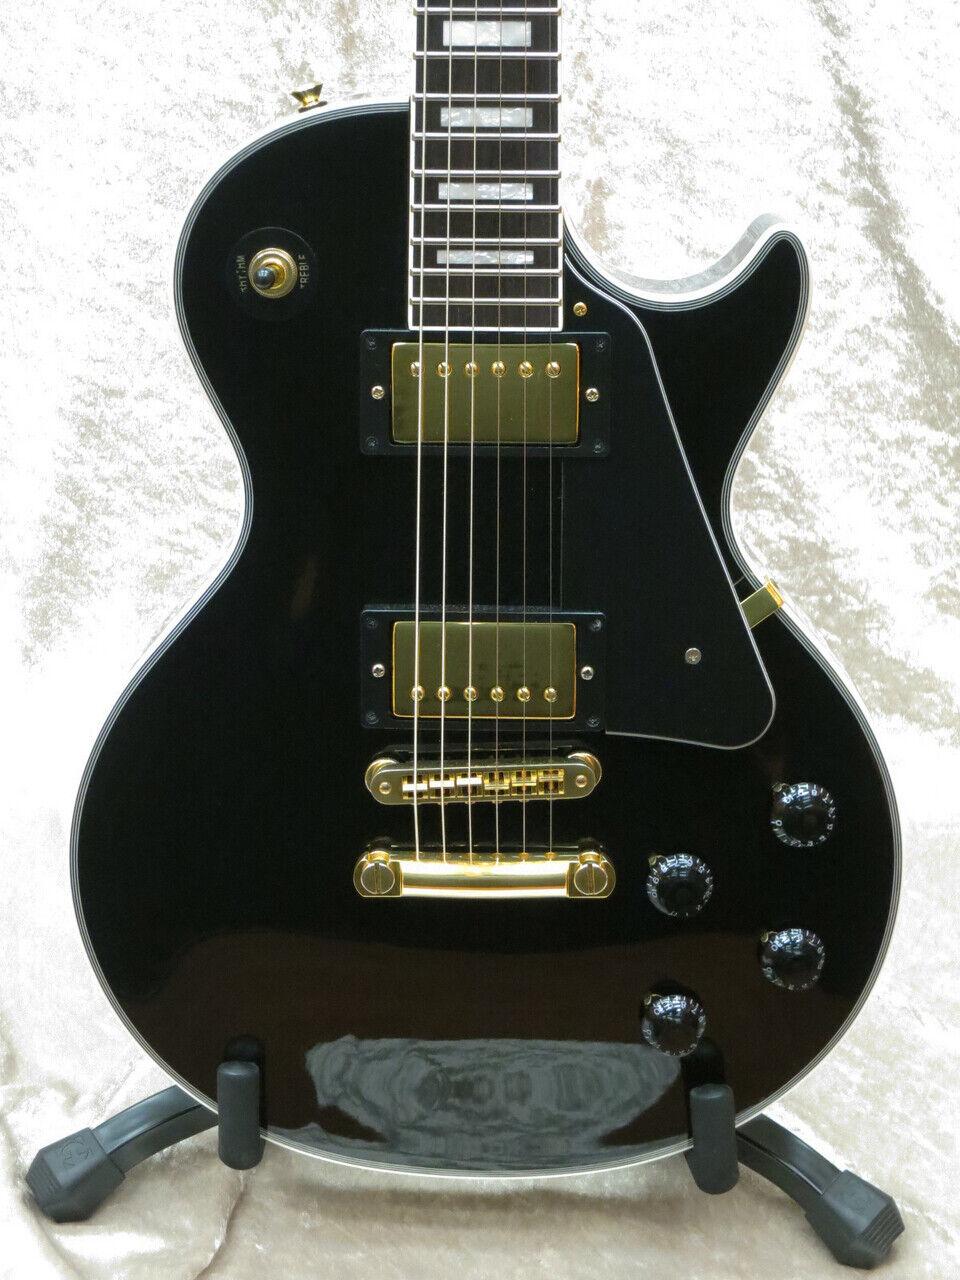 Burny SRLC-55 electric guitar Japan rare beautiful vintage popular EMS F   S